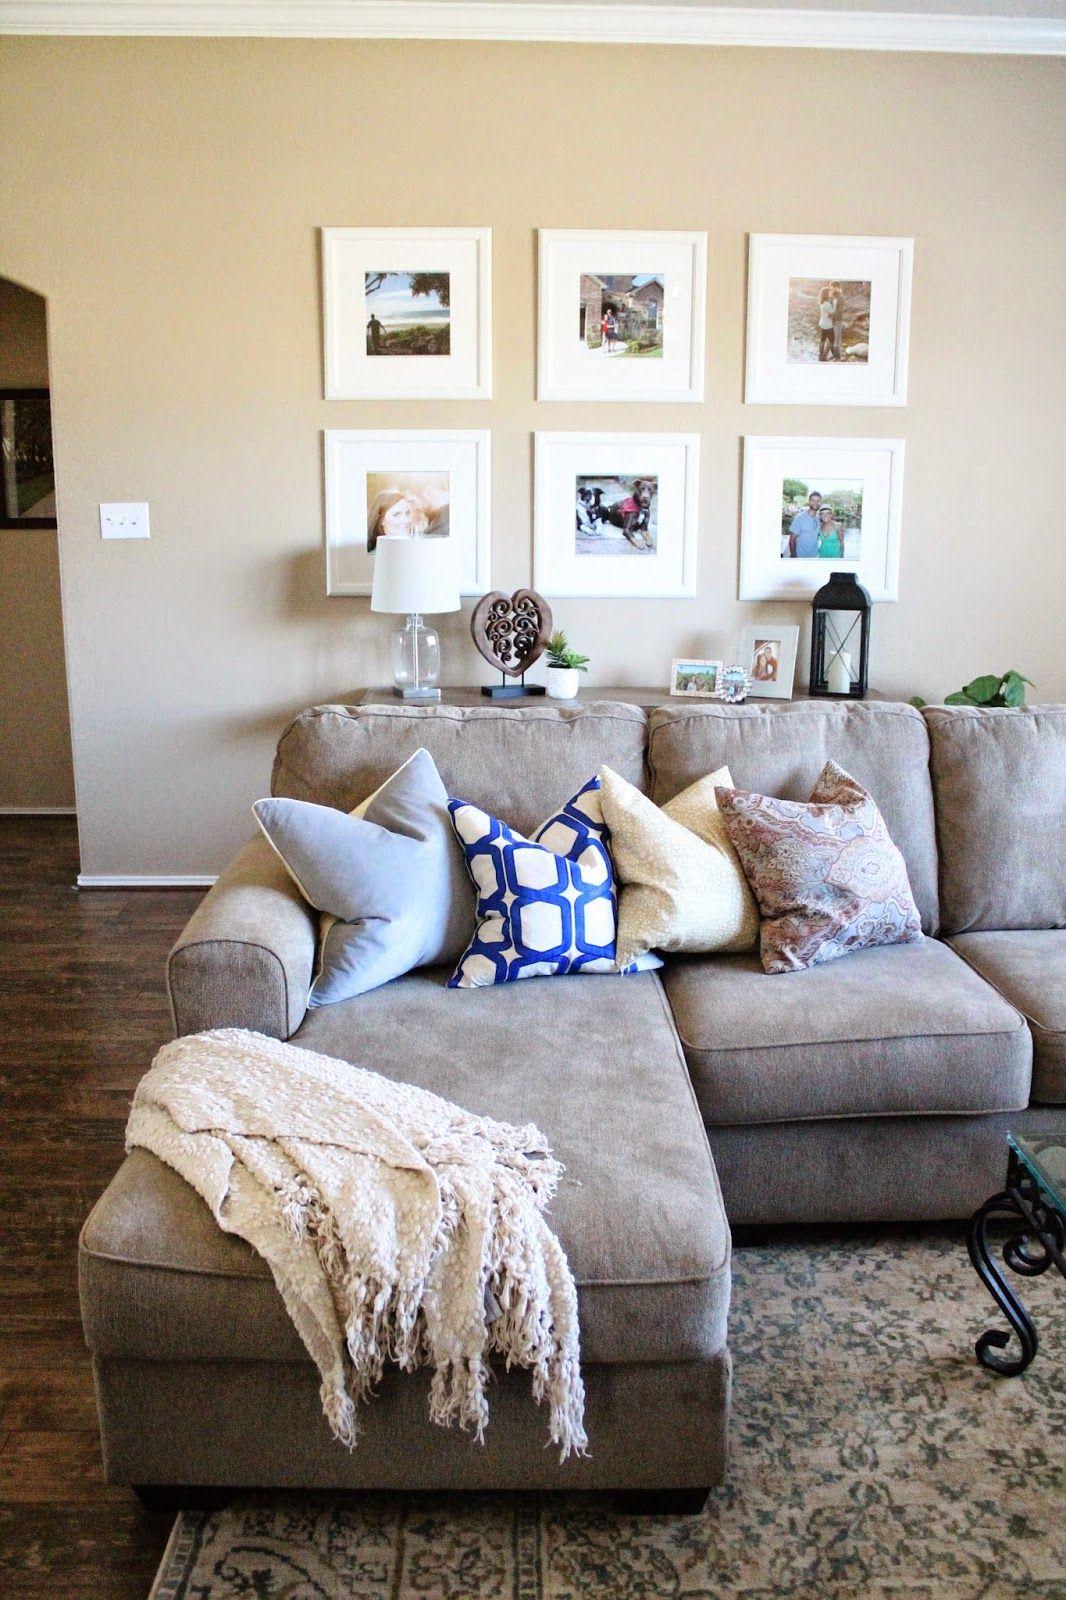 Home Depot Sofa Outdoor Lounge Furniture